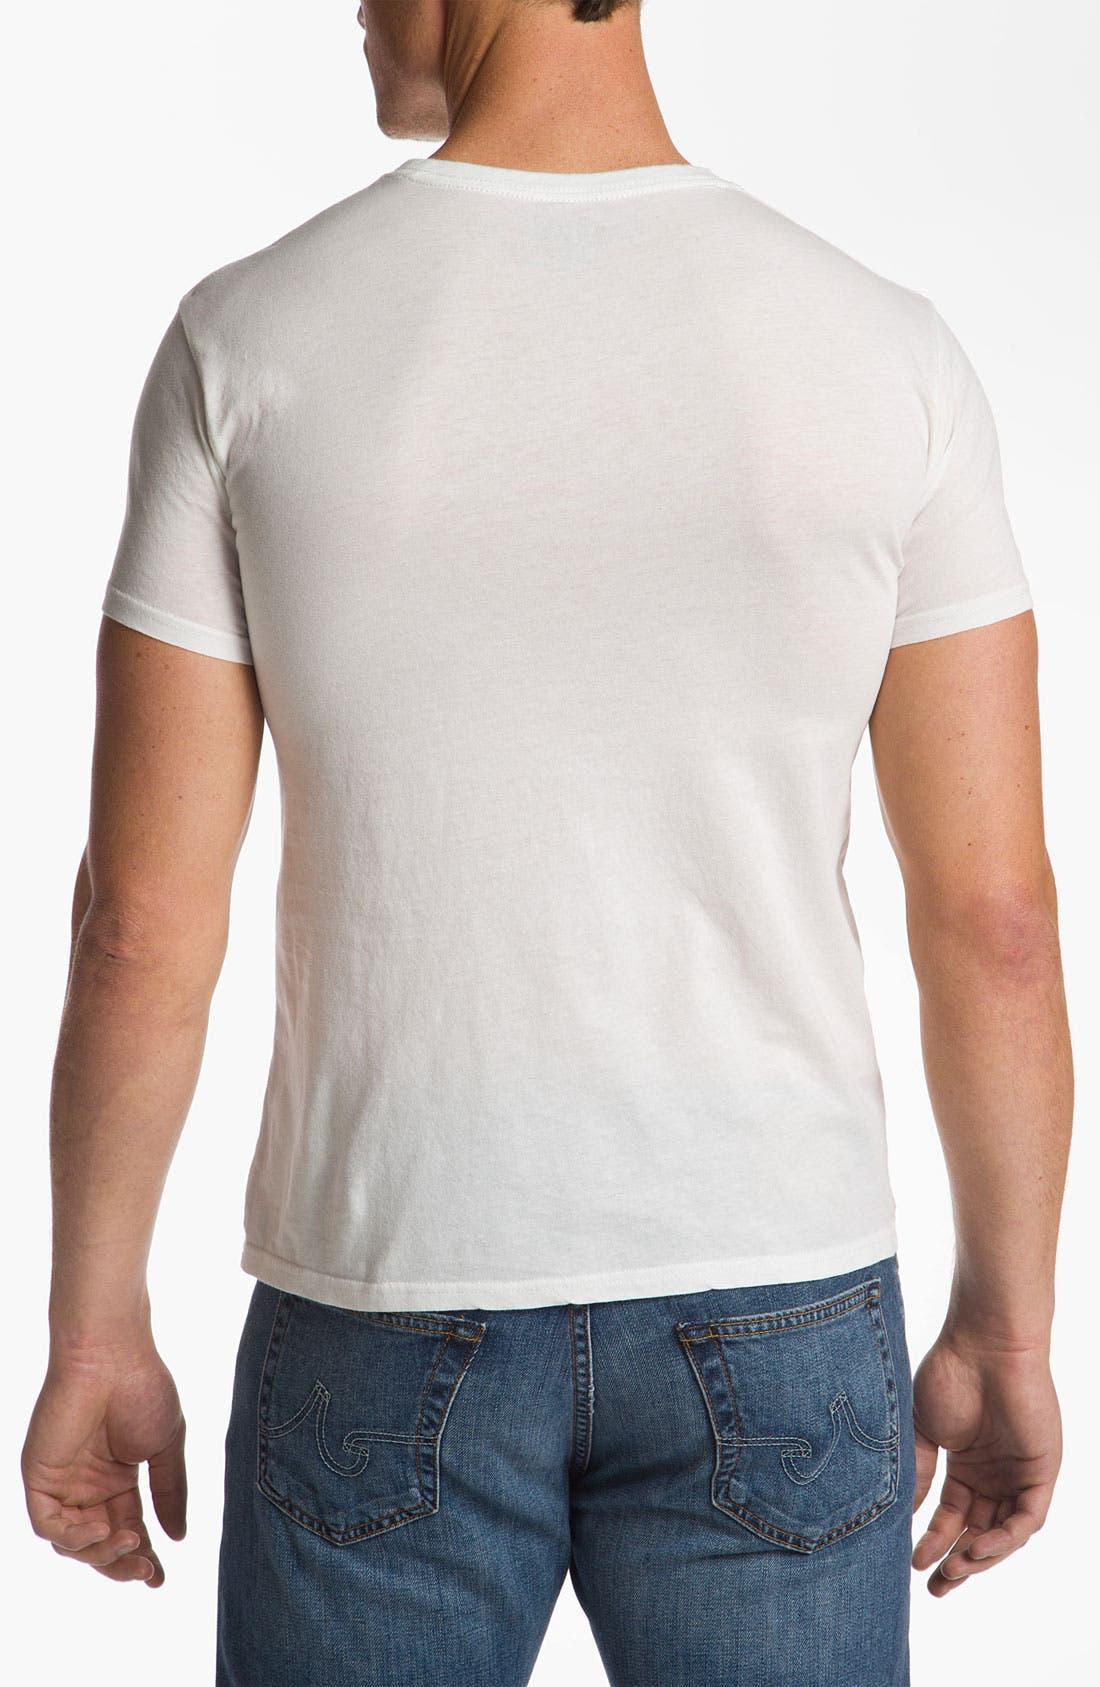 Alternate Image 2  - The Original Retro Brand 'Pittsburg Panthers' T-Shirt